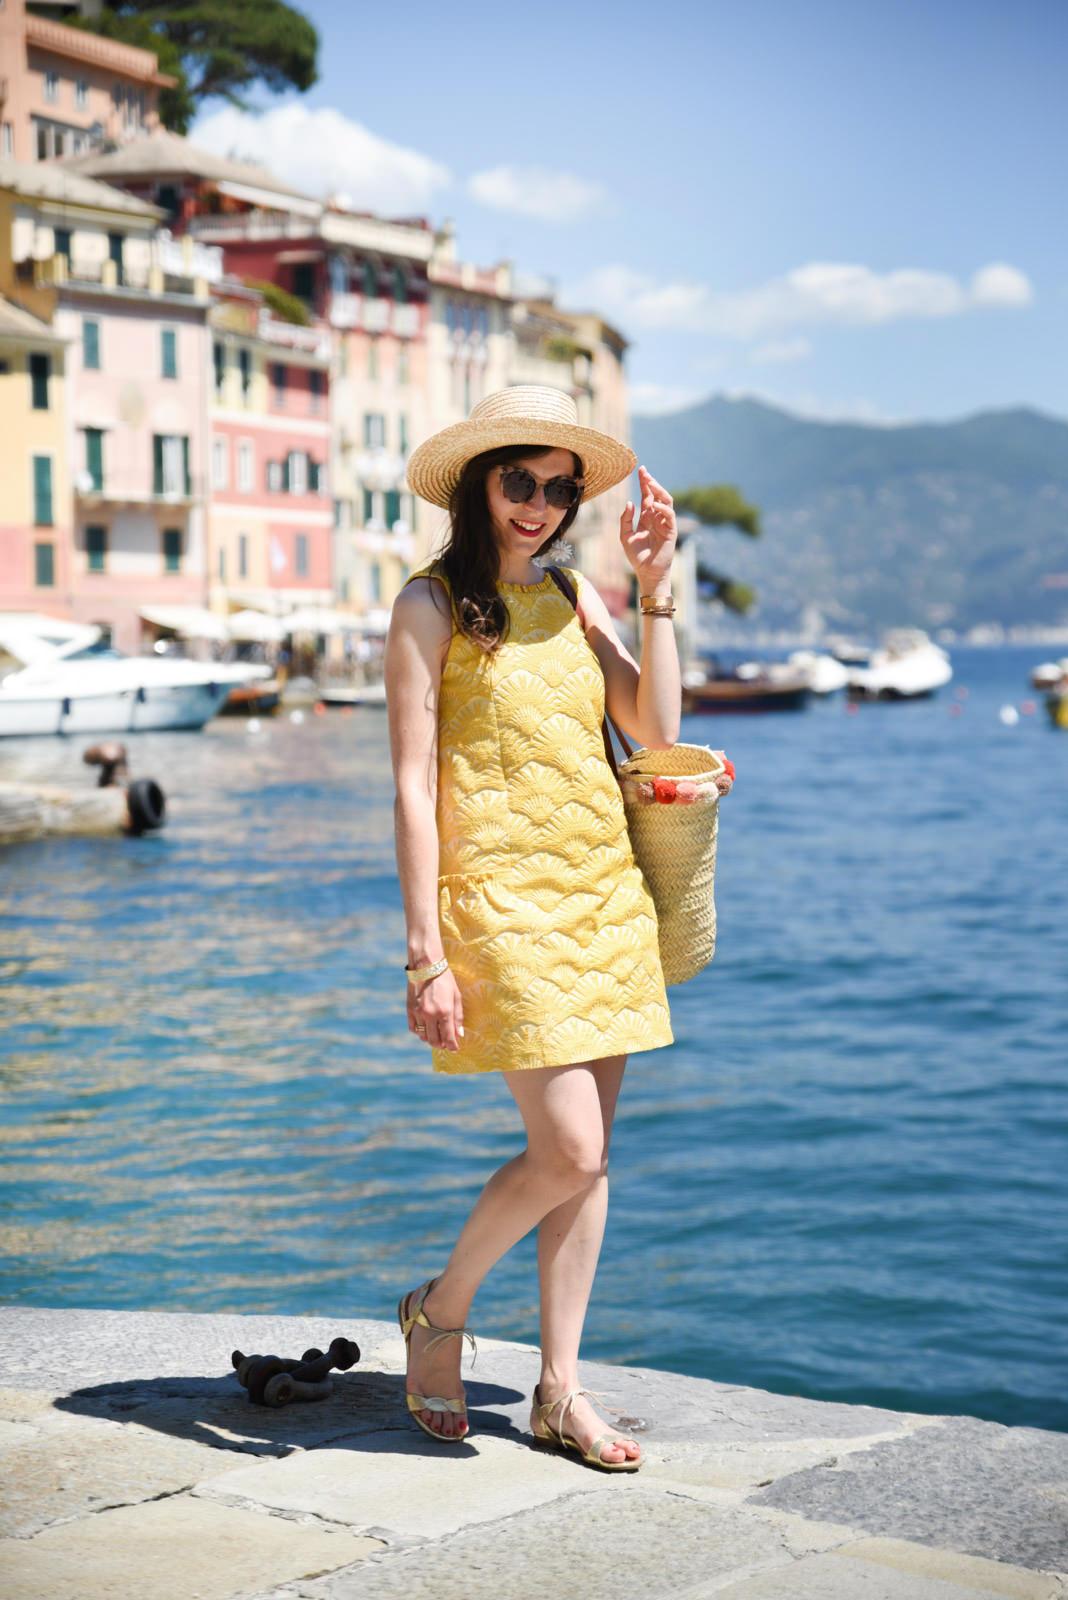 Blog-Mode-And-The-City-Lifestyle-Italie-Portofino-Belmond-Hotel-15 copie